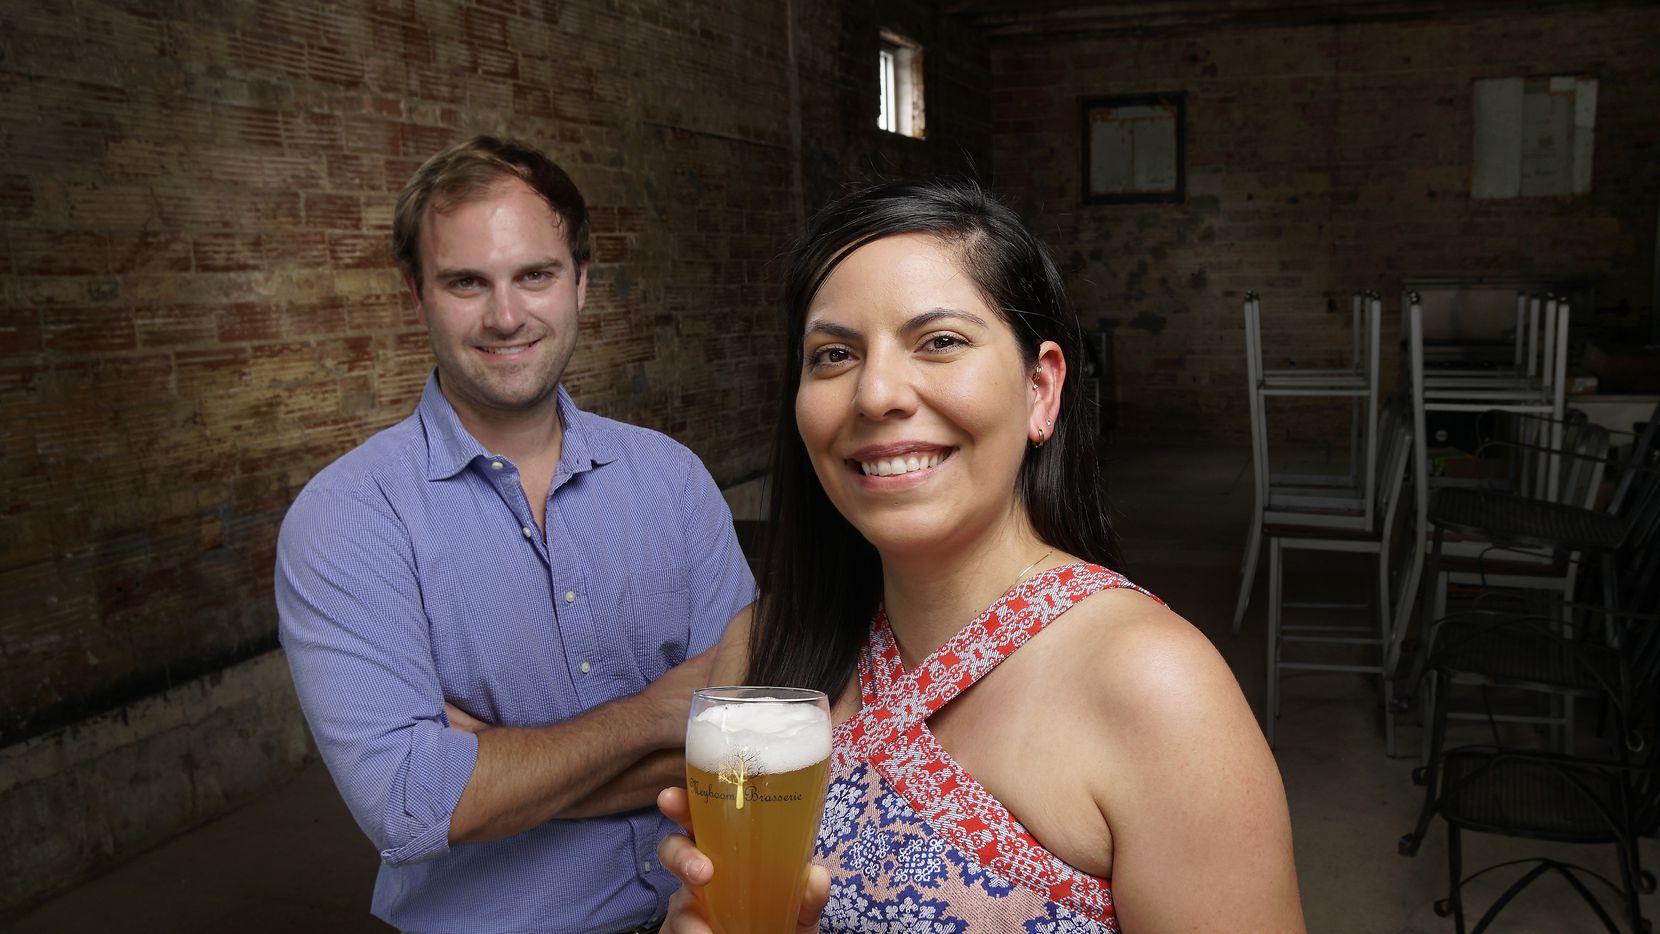 Jeff Karetnick and April Segovia stand inside the future home of Meyboom Brasserie on Greenville Avenue in Dallas.